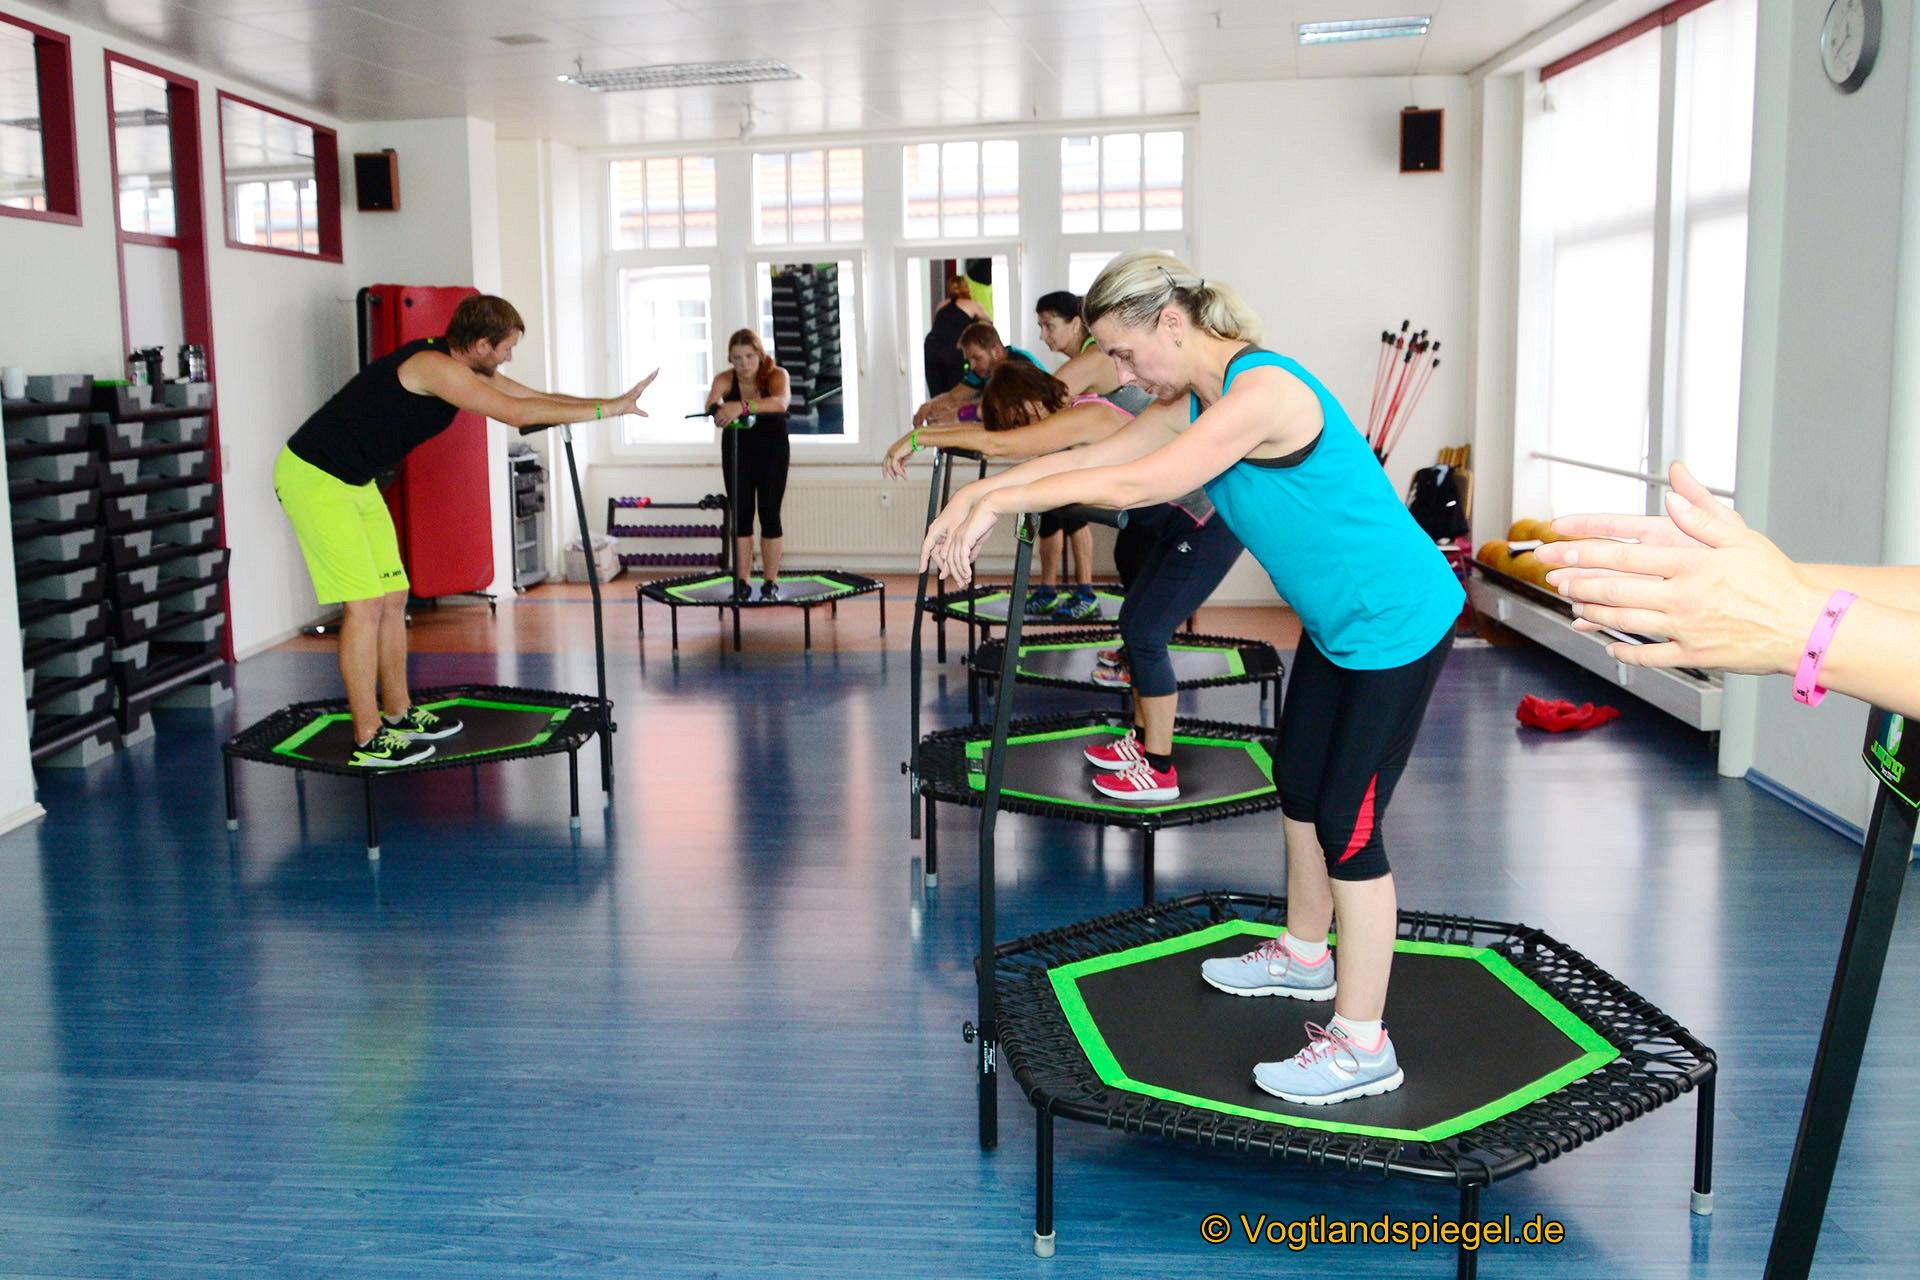 Team des Gesundheitszentrum Friends absolviert Jumping Fitness Basic Ausbildung